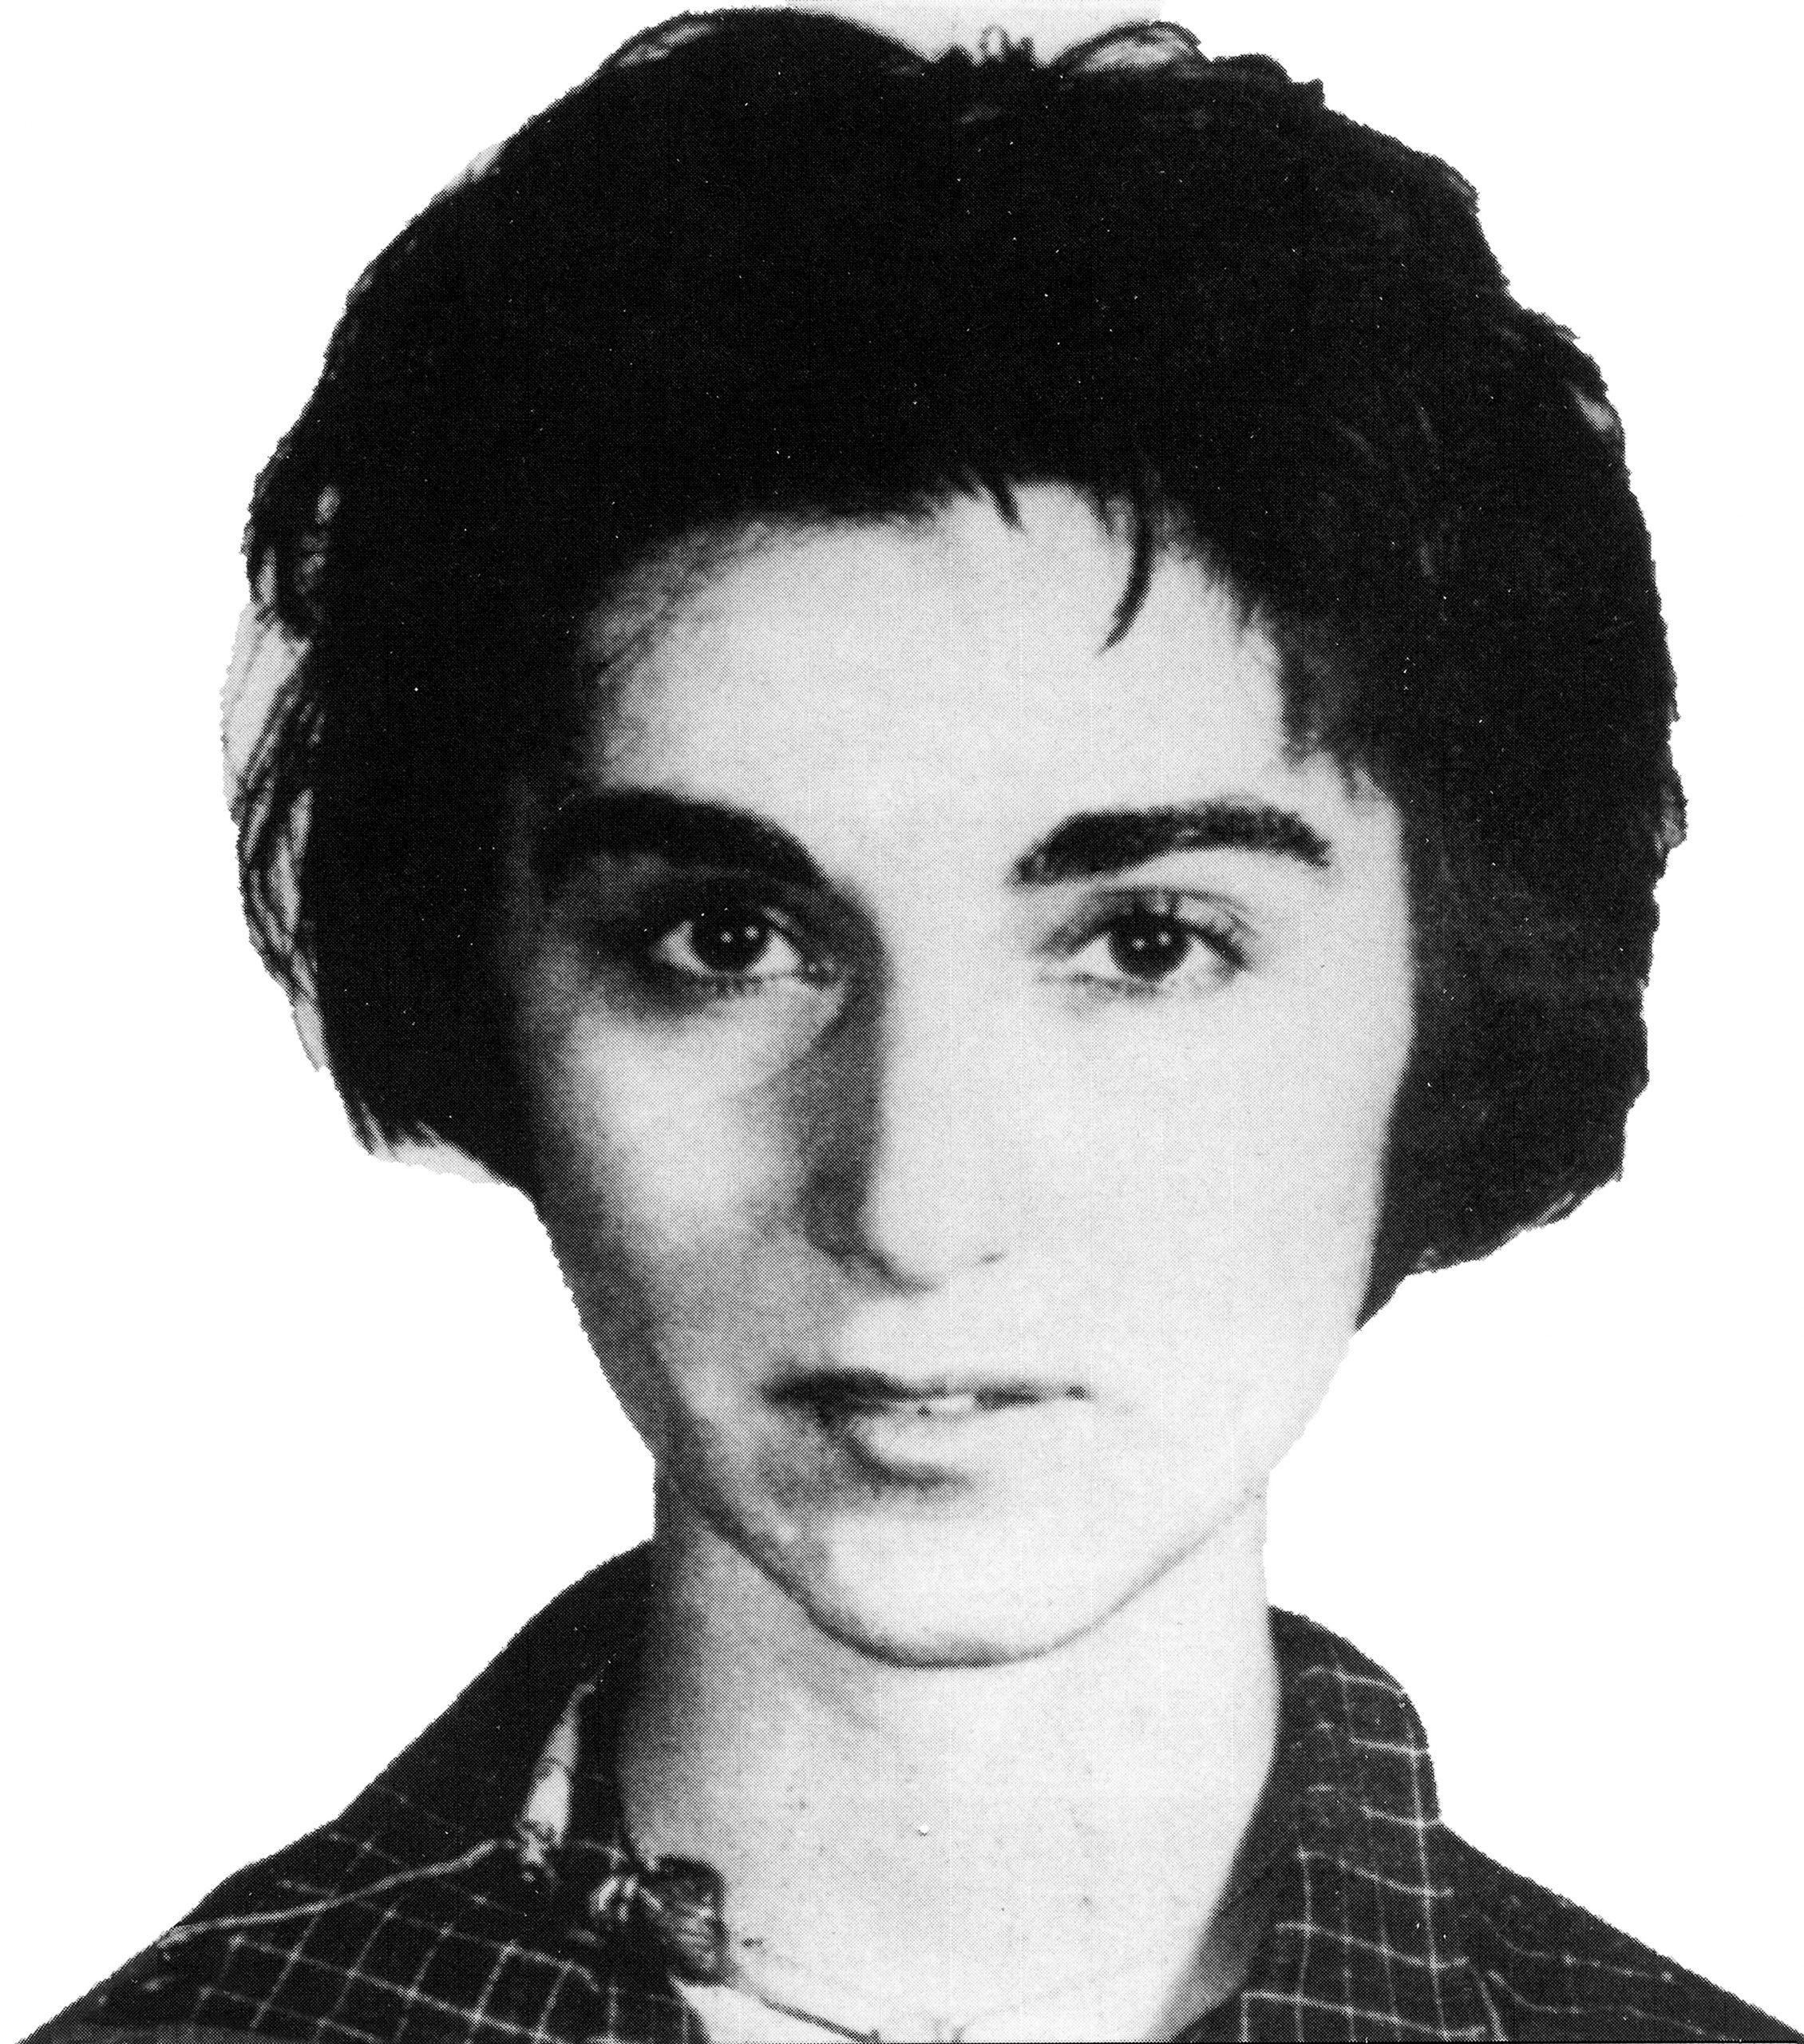 Genovese in a 1961 mug shot, following a gambling arrest